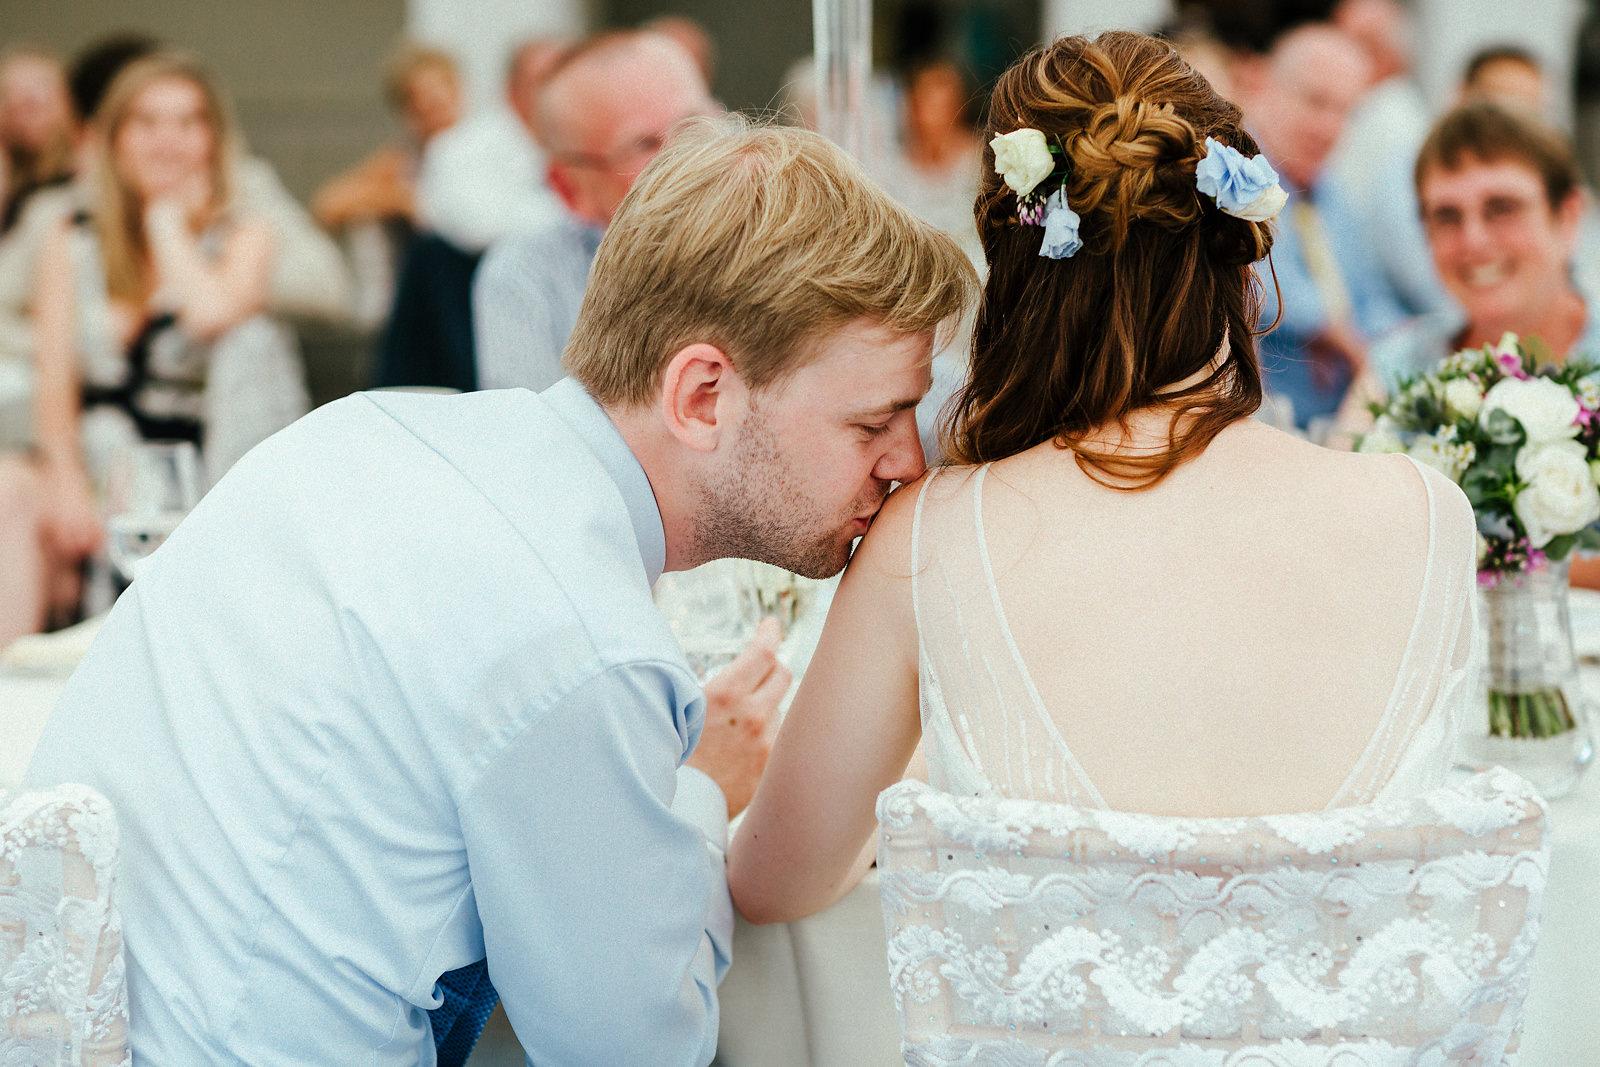 Happy groom kissing the bride